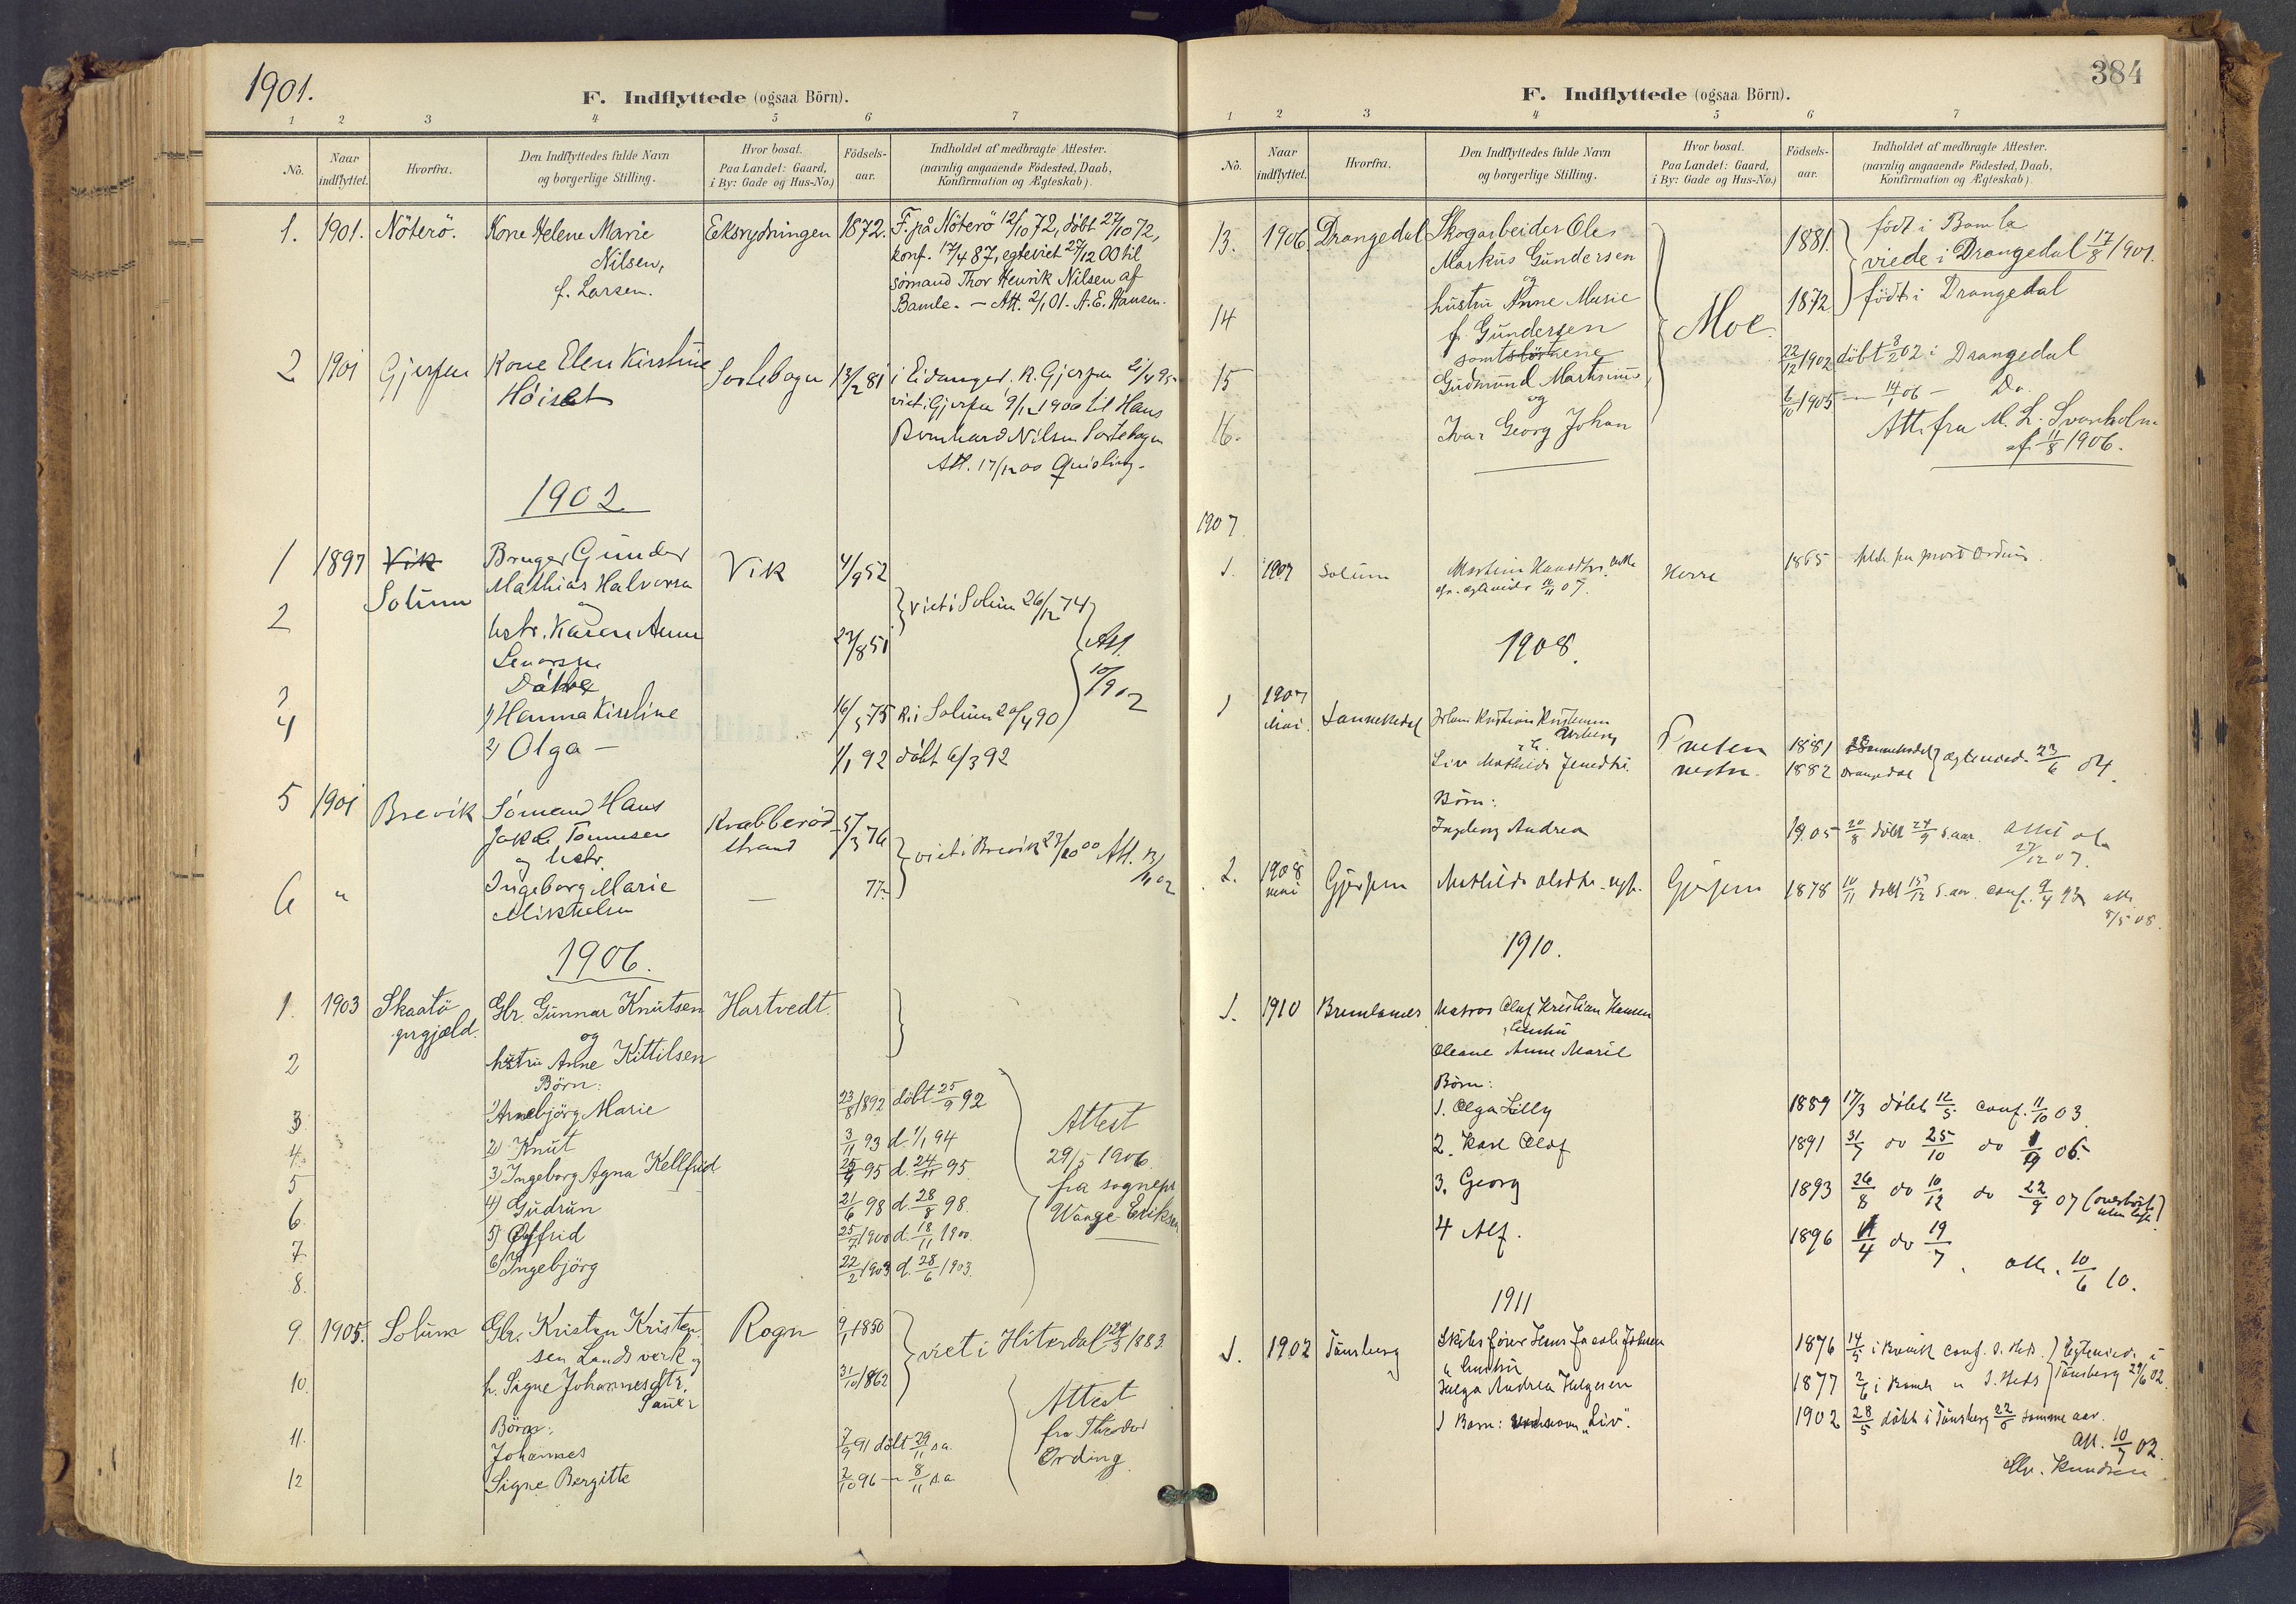 SAKO, Bamble kirkebøker, F/Fa/L0009: Ministerialbok nr. I 9, 1901-1917, s. 384